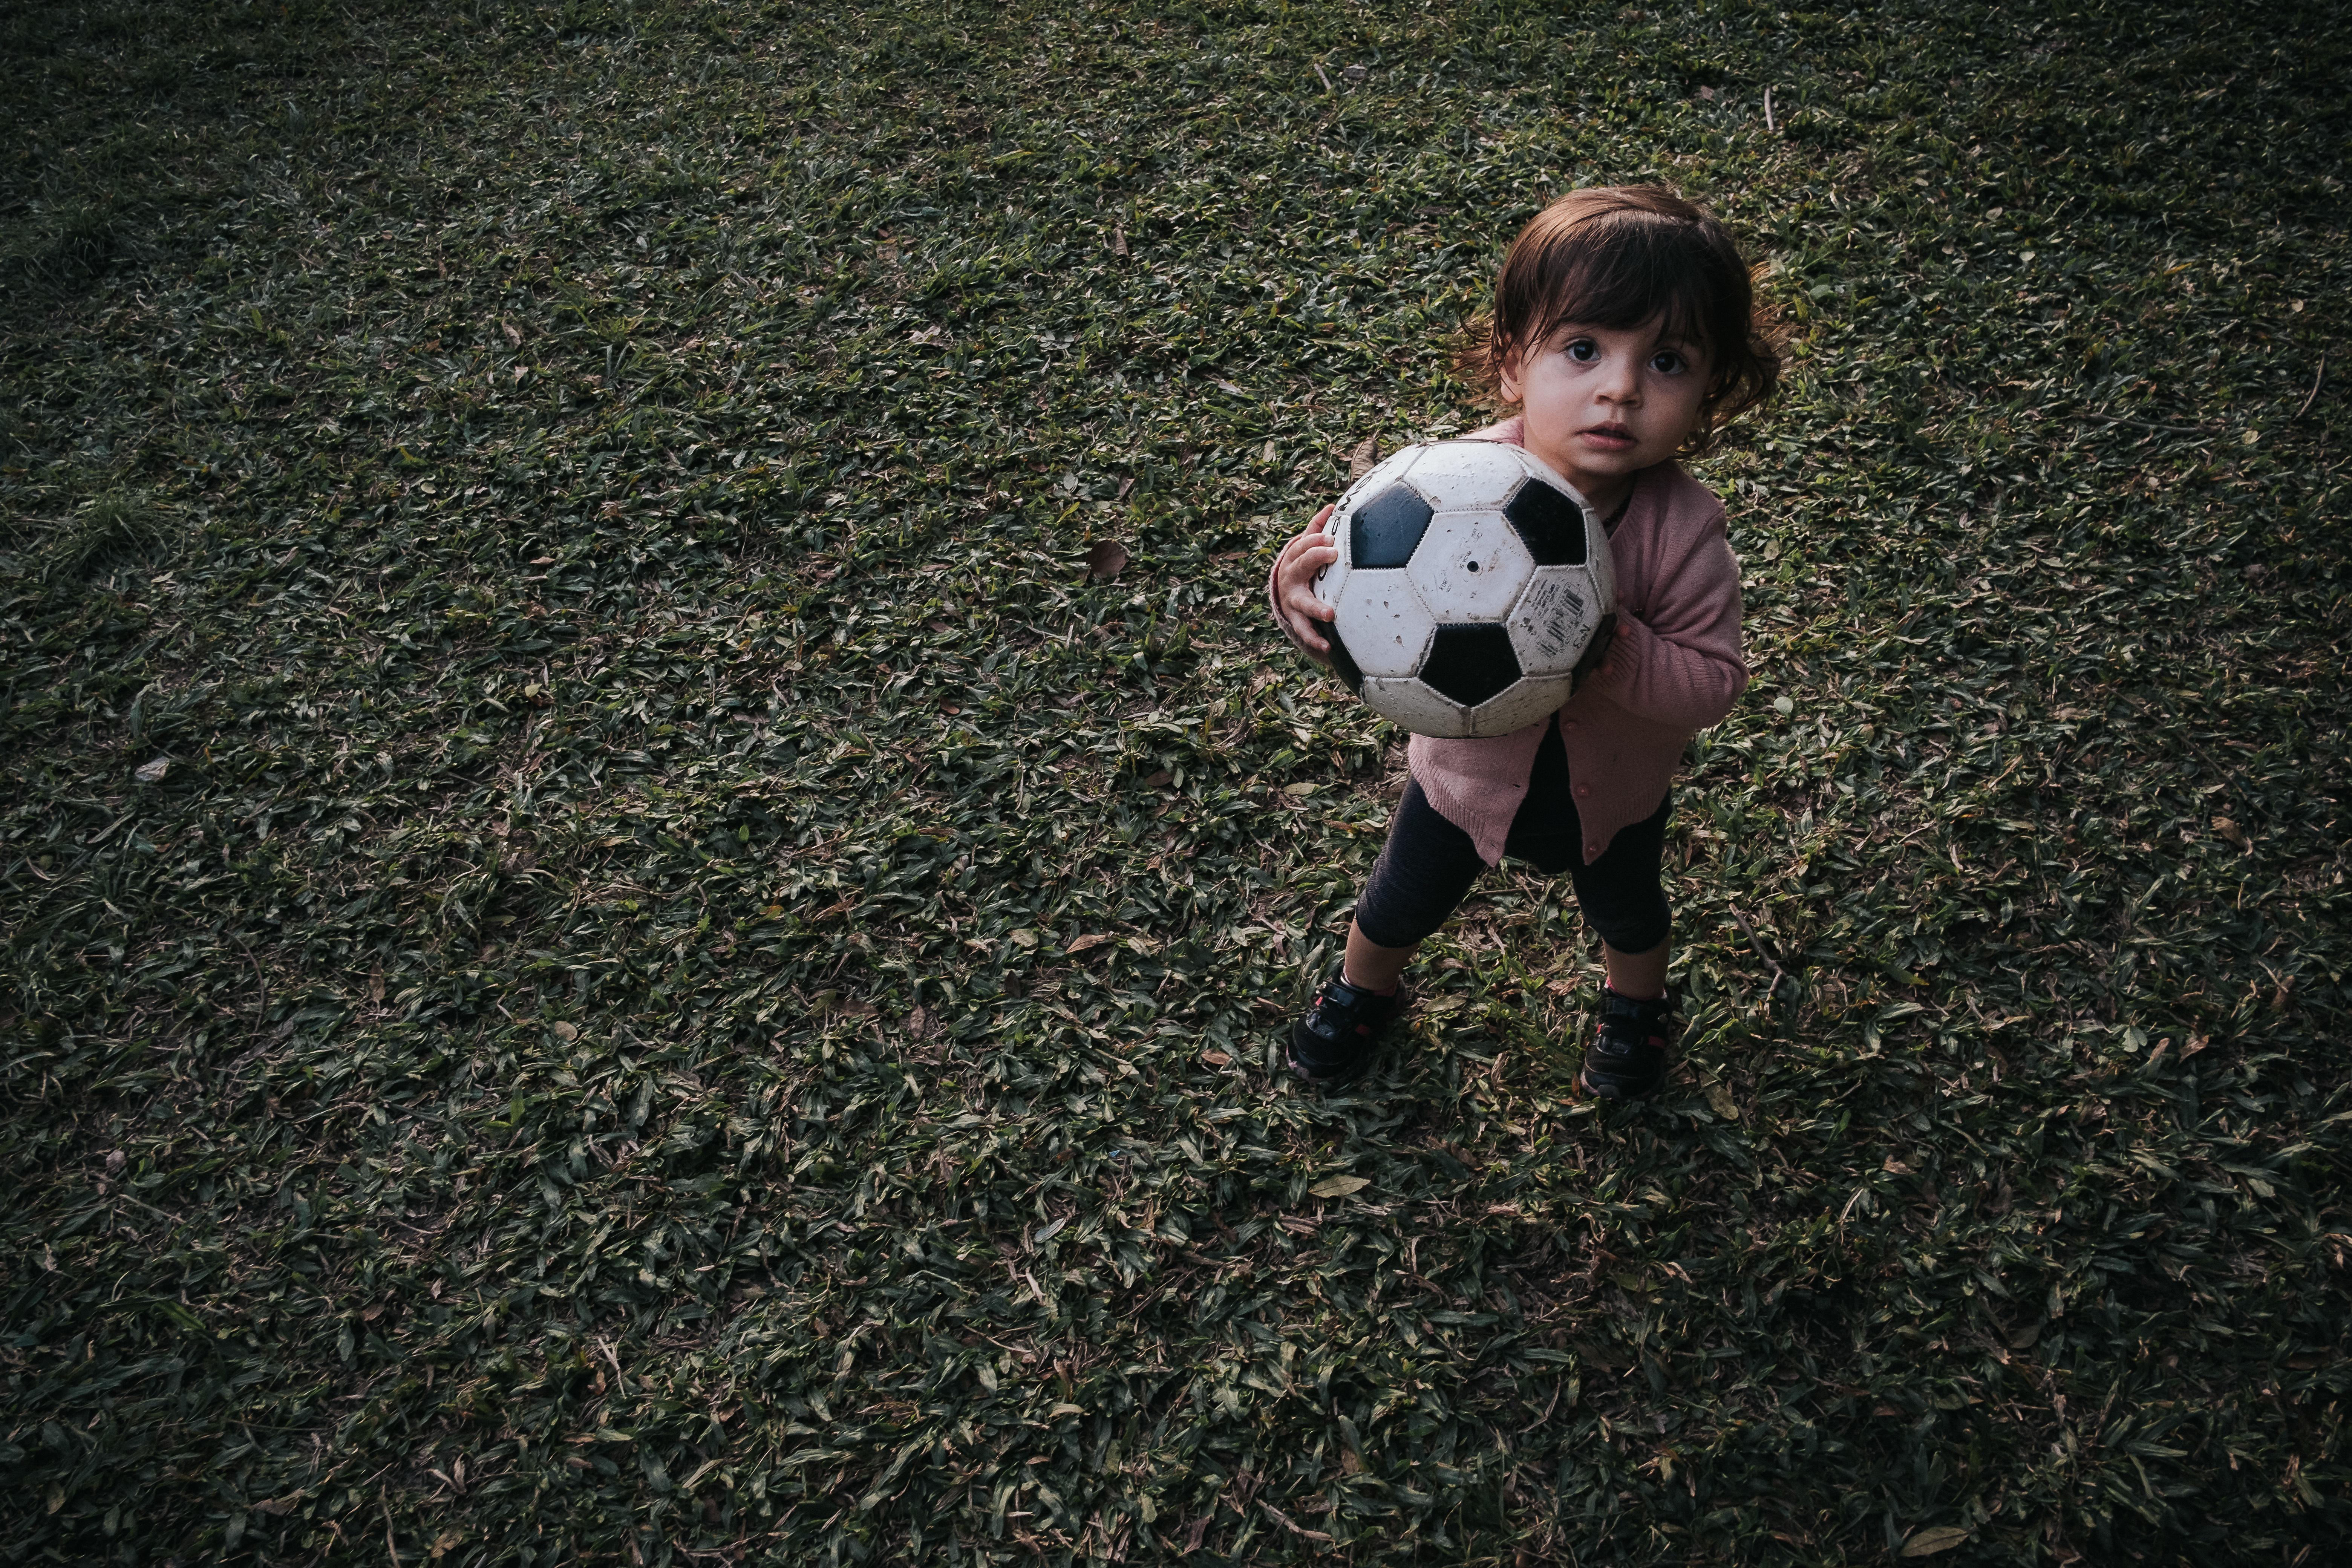 Contate Fotógrafo de família, casamentos e ensaios - Thiago Braga - Florianópolis